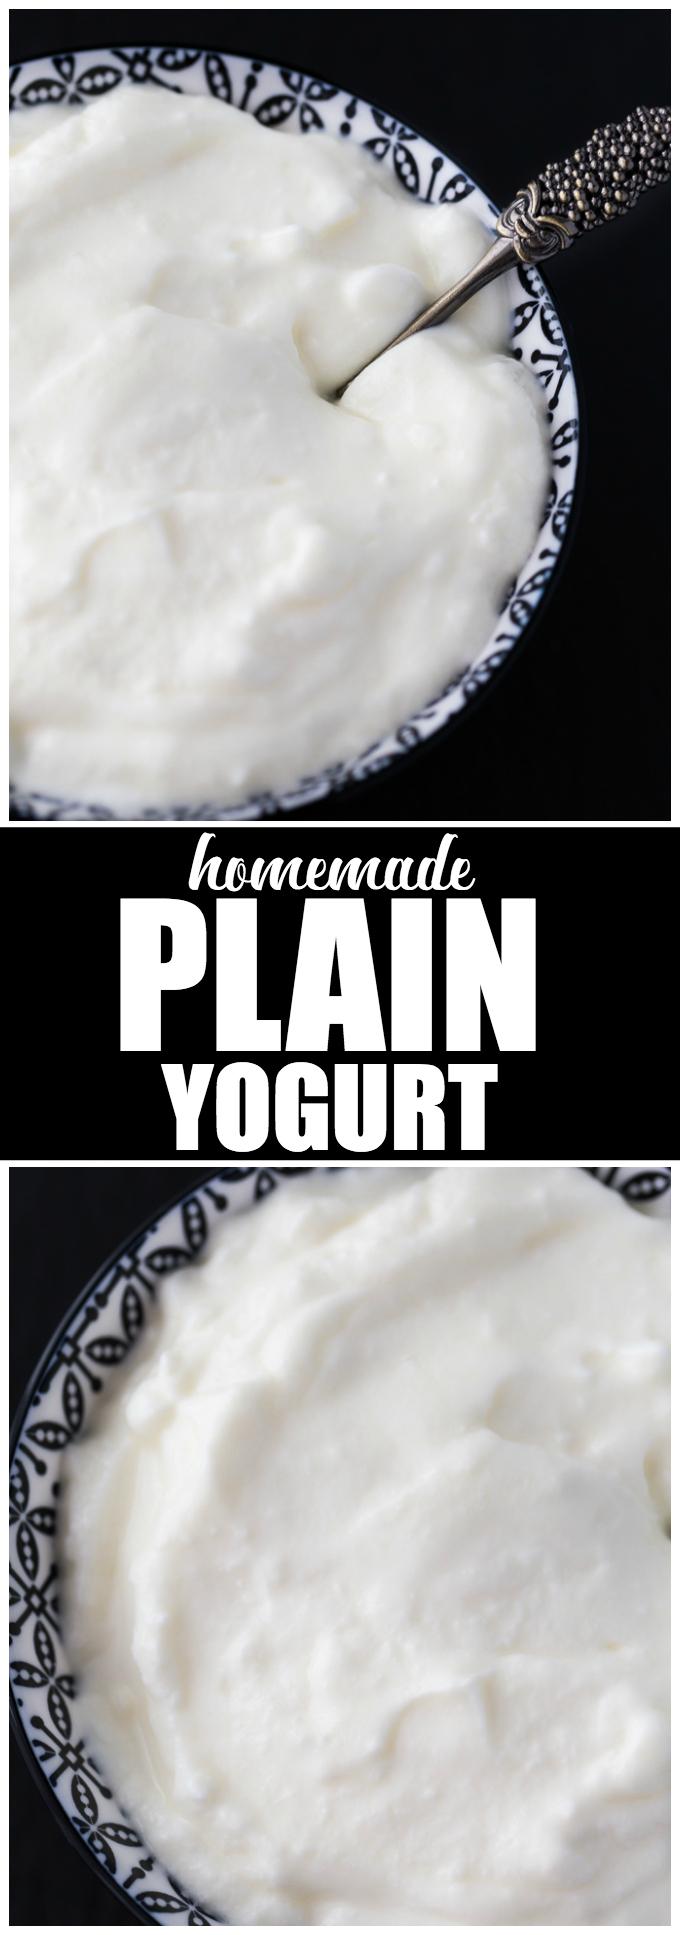 Homemade Plain Yogurt - Thick, creamy and tastes better than the storebought stuff!